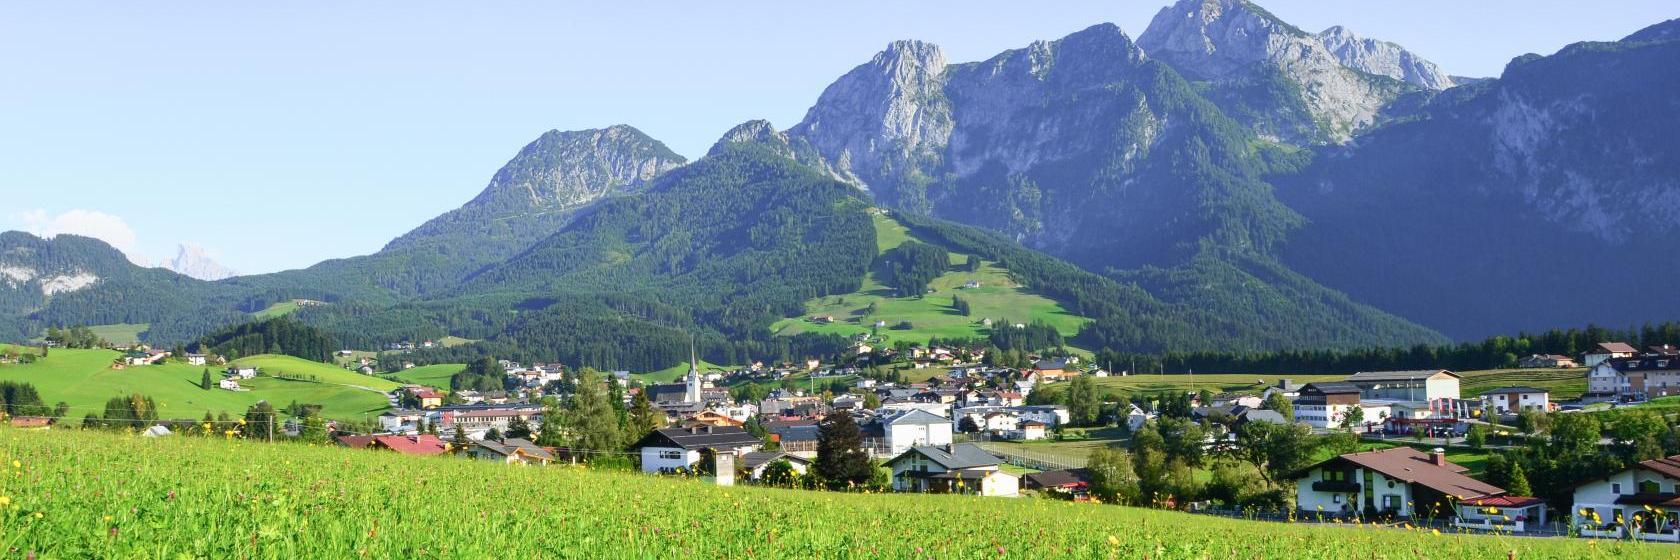 Accommodation Abtenau im Lammertal: Hotels - BERGFEX